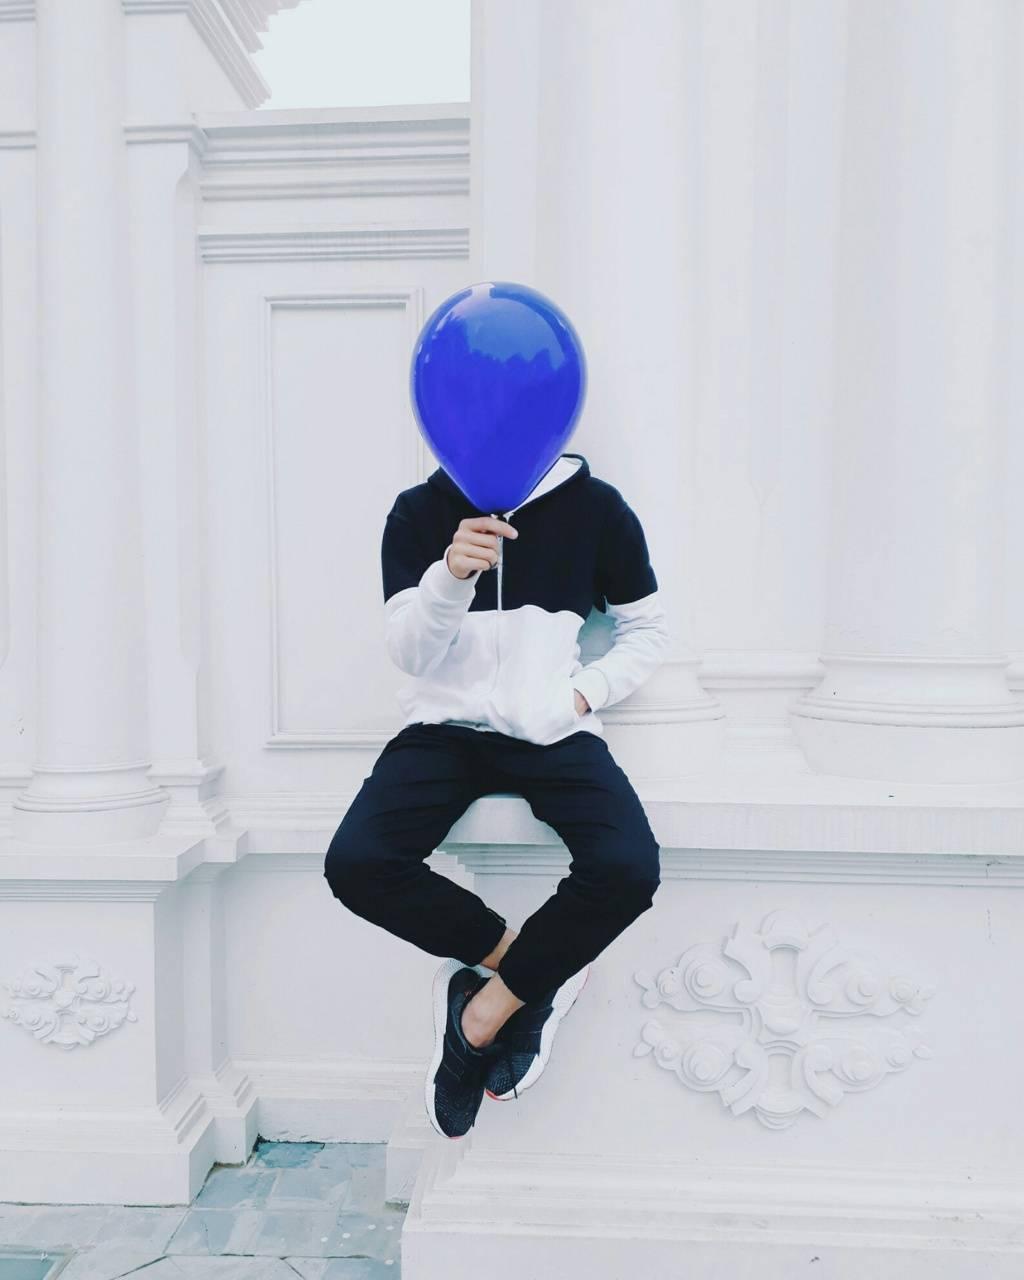 Chico con globo azul